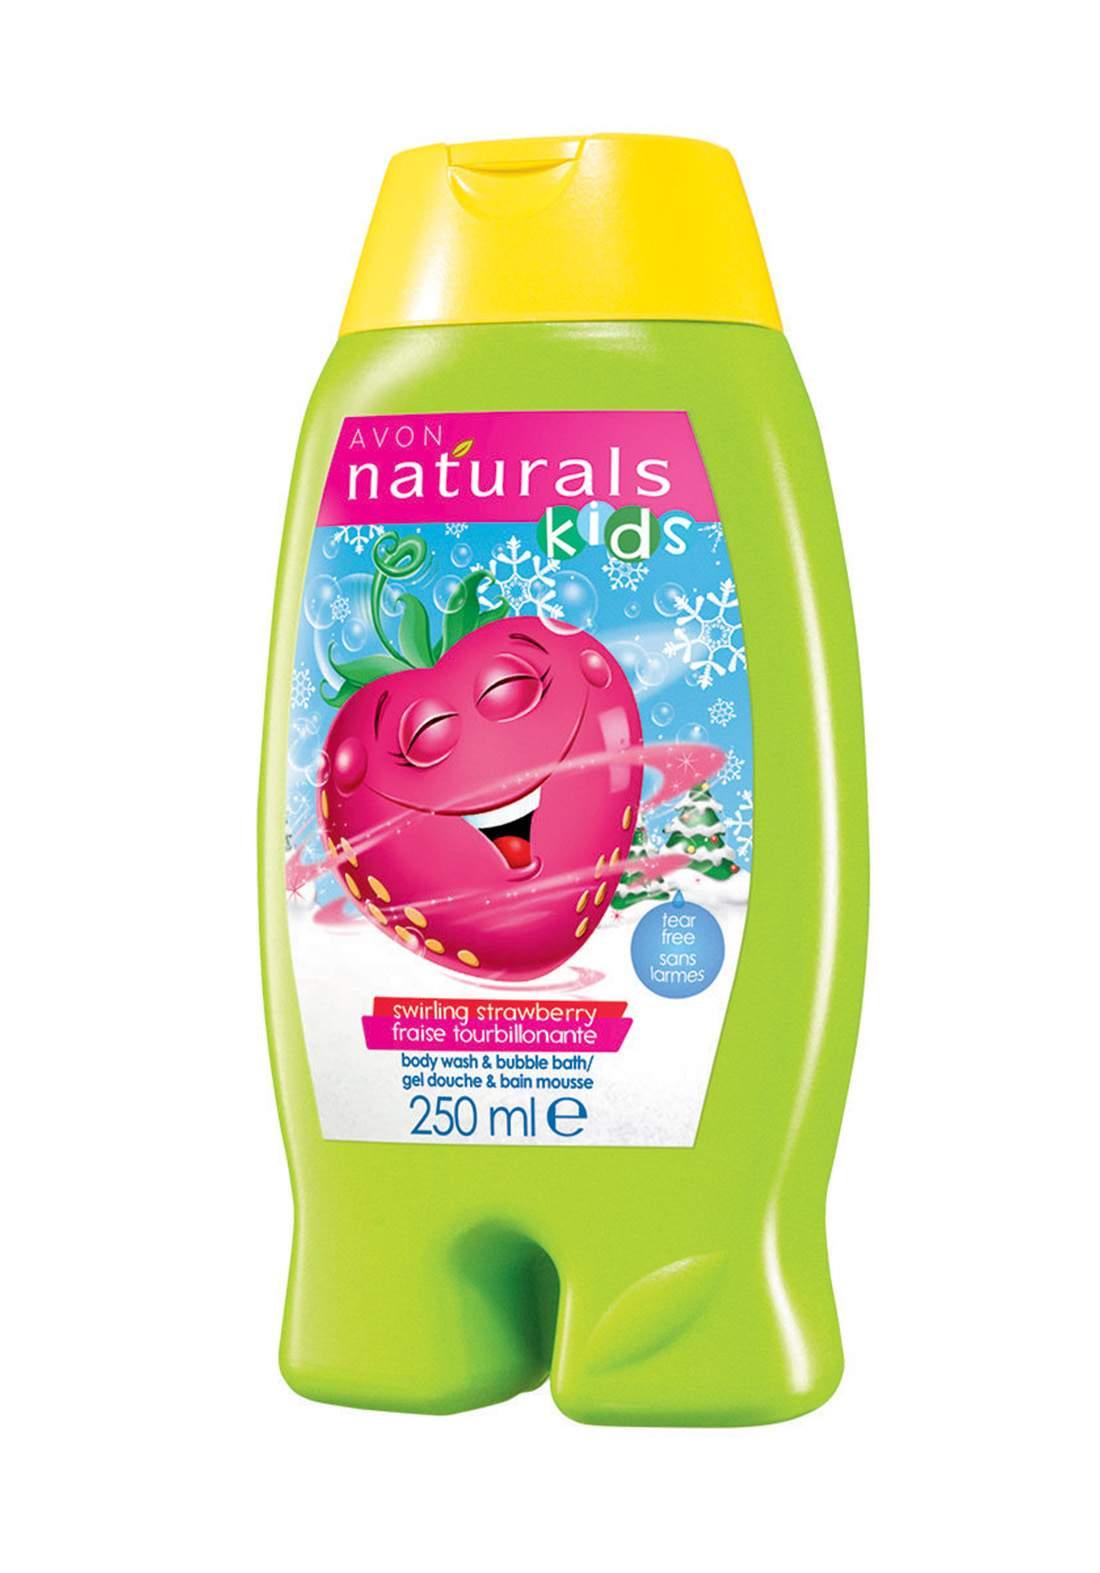 (1818400)Avon Naturals Bubble Bath For Kids 250 ml فقاعات حوض الاستحمام للأطفال